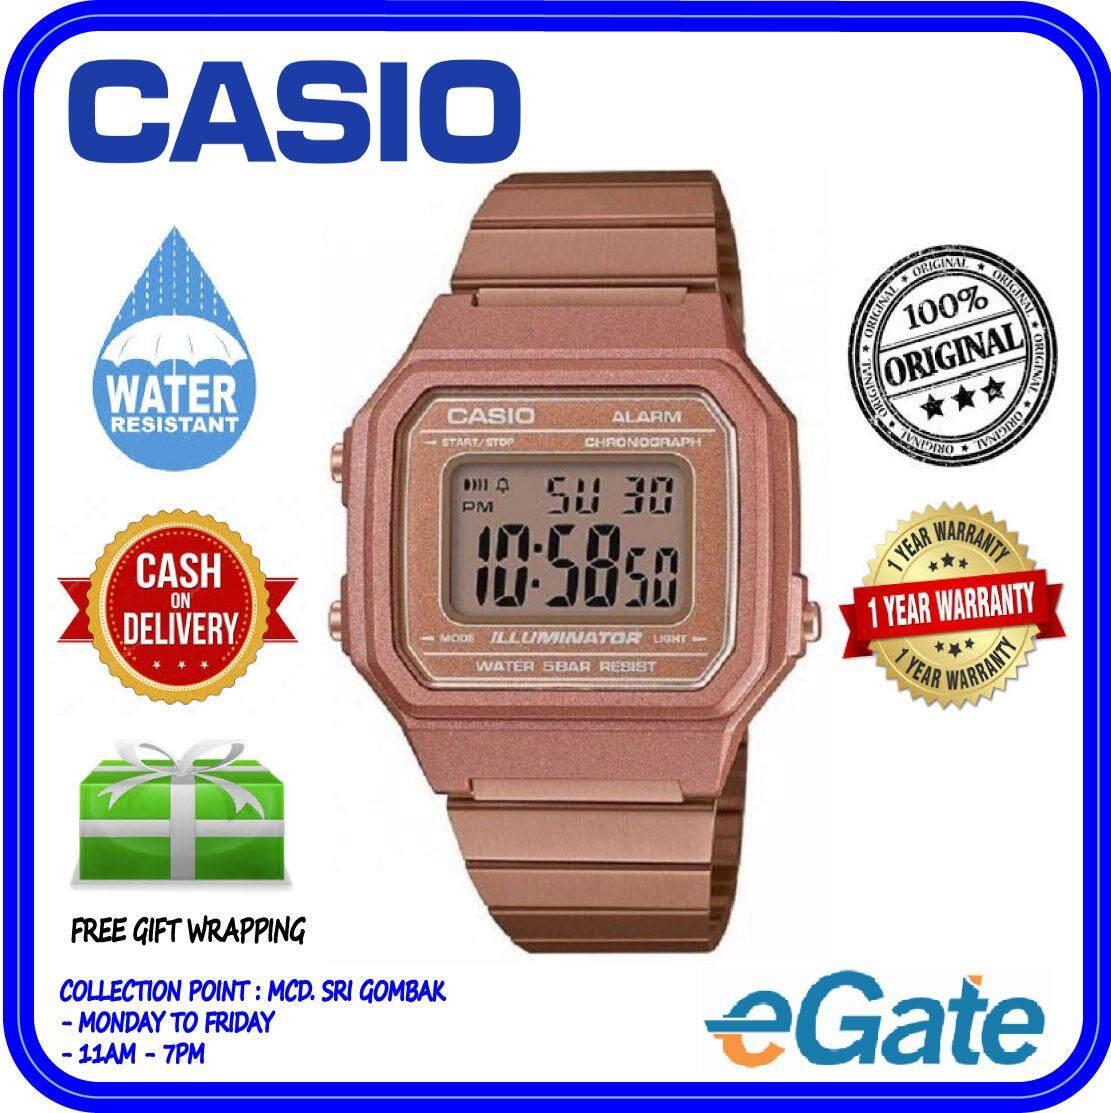 Casio Watches With Best Price At Lazada Malaysia G Shock Series Ga 100 Jam Tangan Pria Strap Resin B650wc 5a Unisex Rose Gold Digital Watch Classic Square Design Original